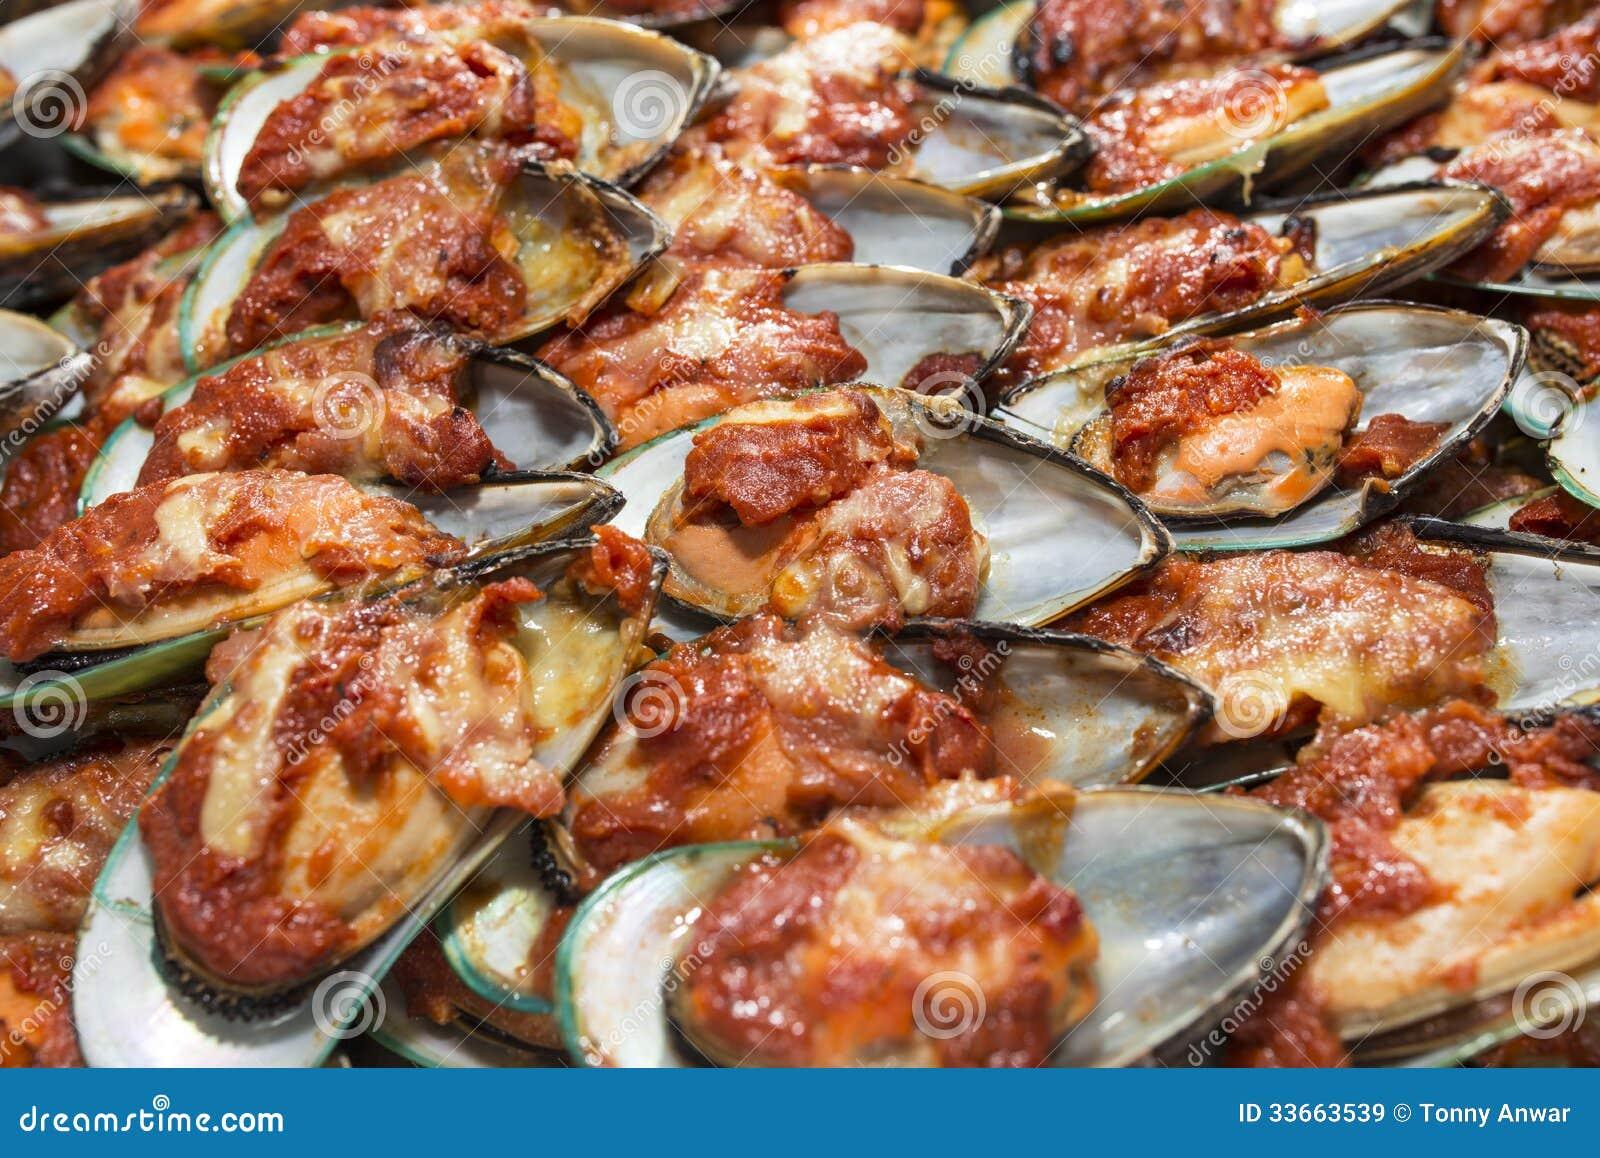 tomato sauce grilled mexican chorizo with spicy tomato caper sauce